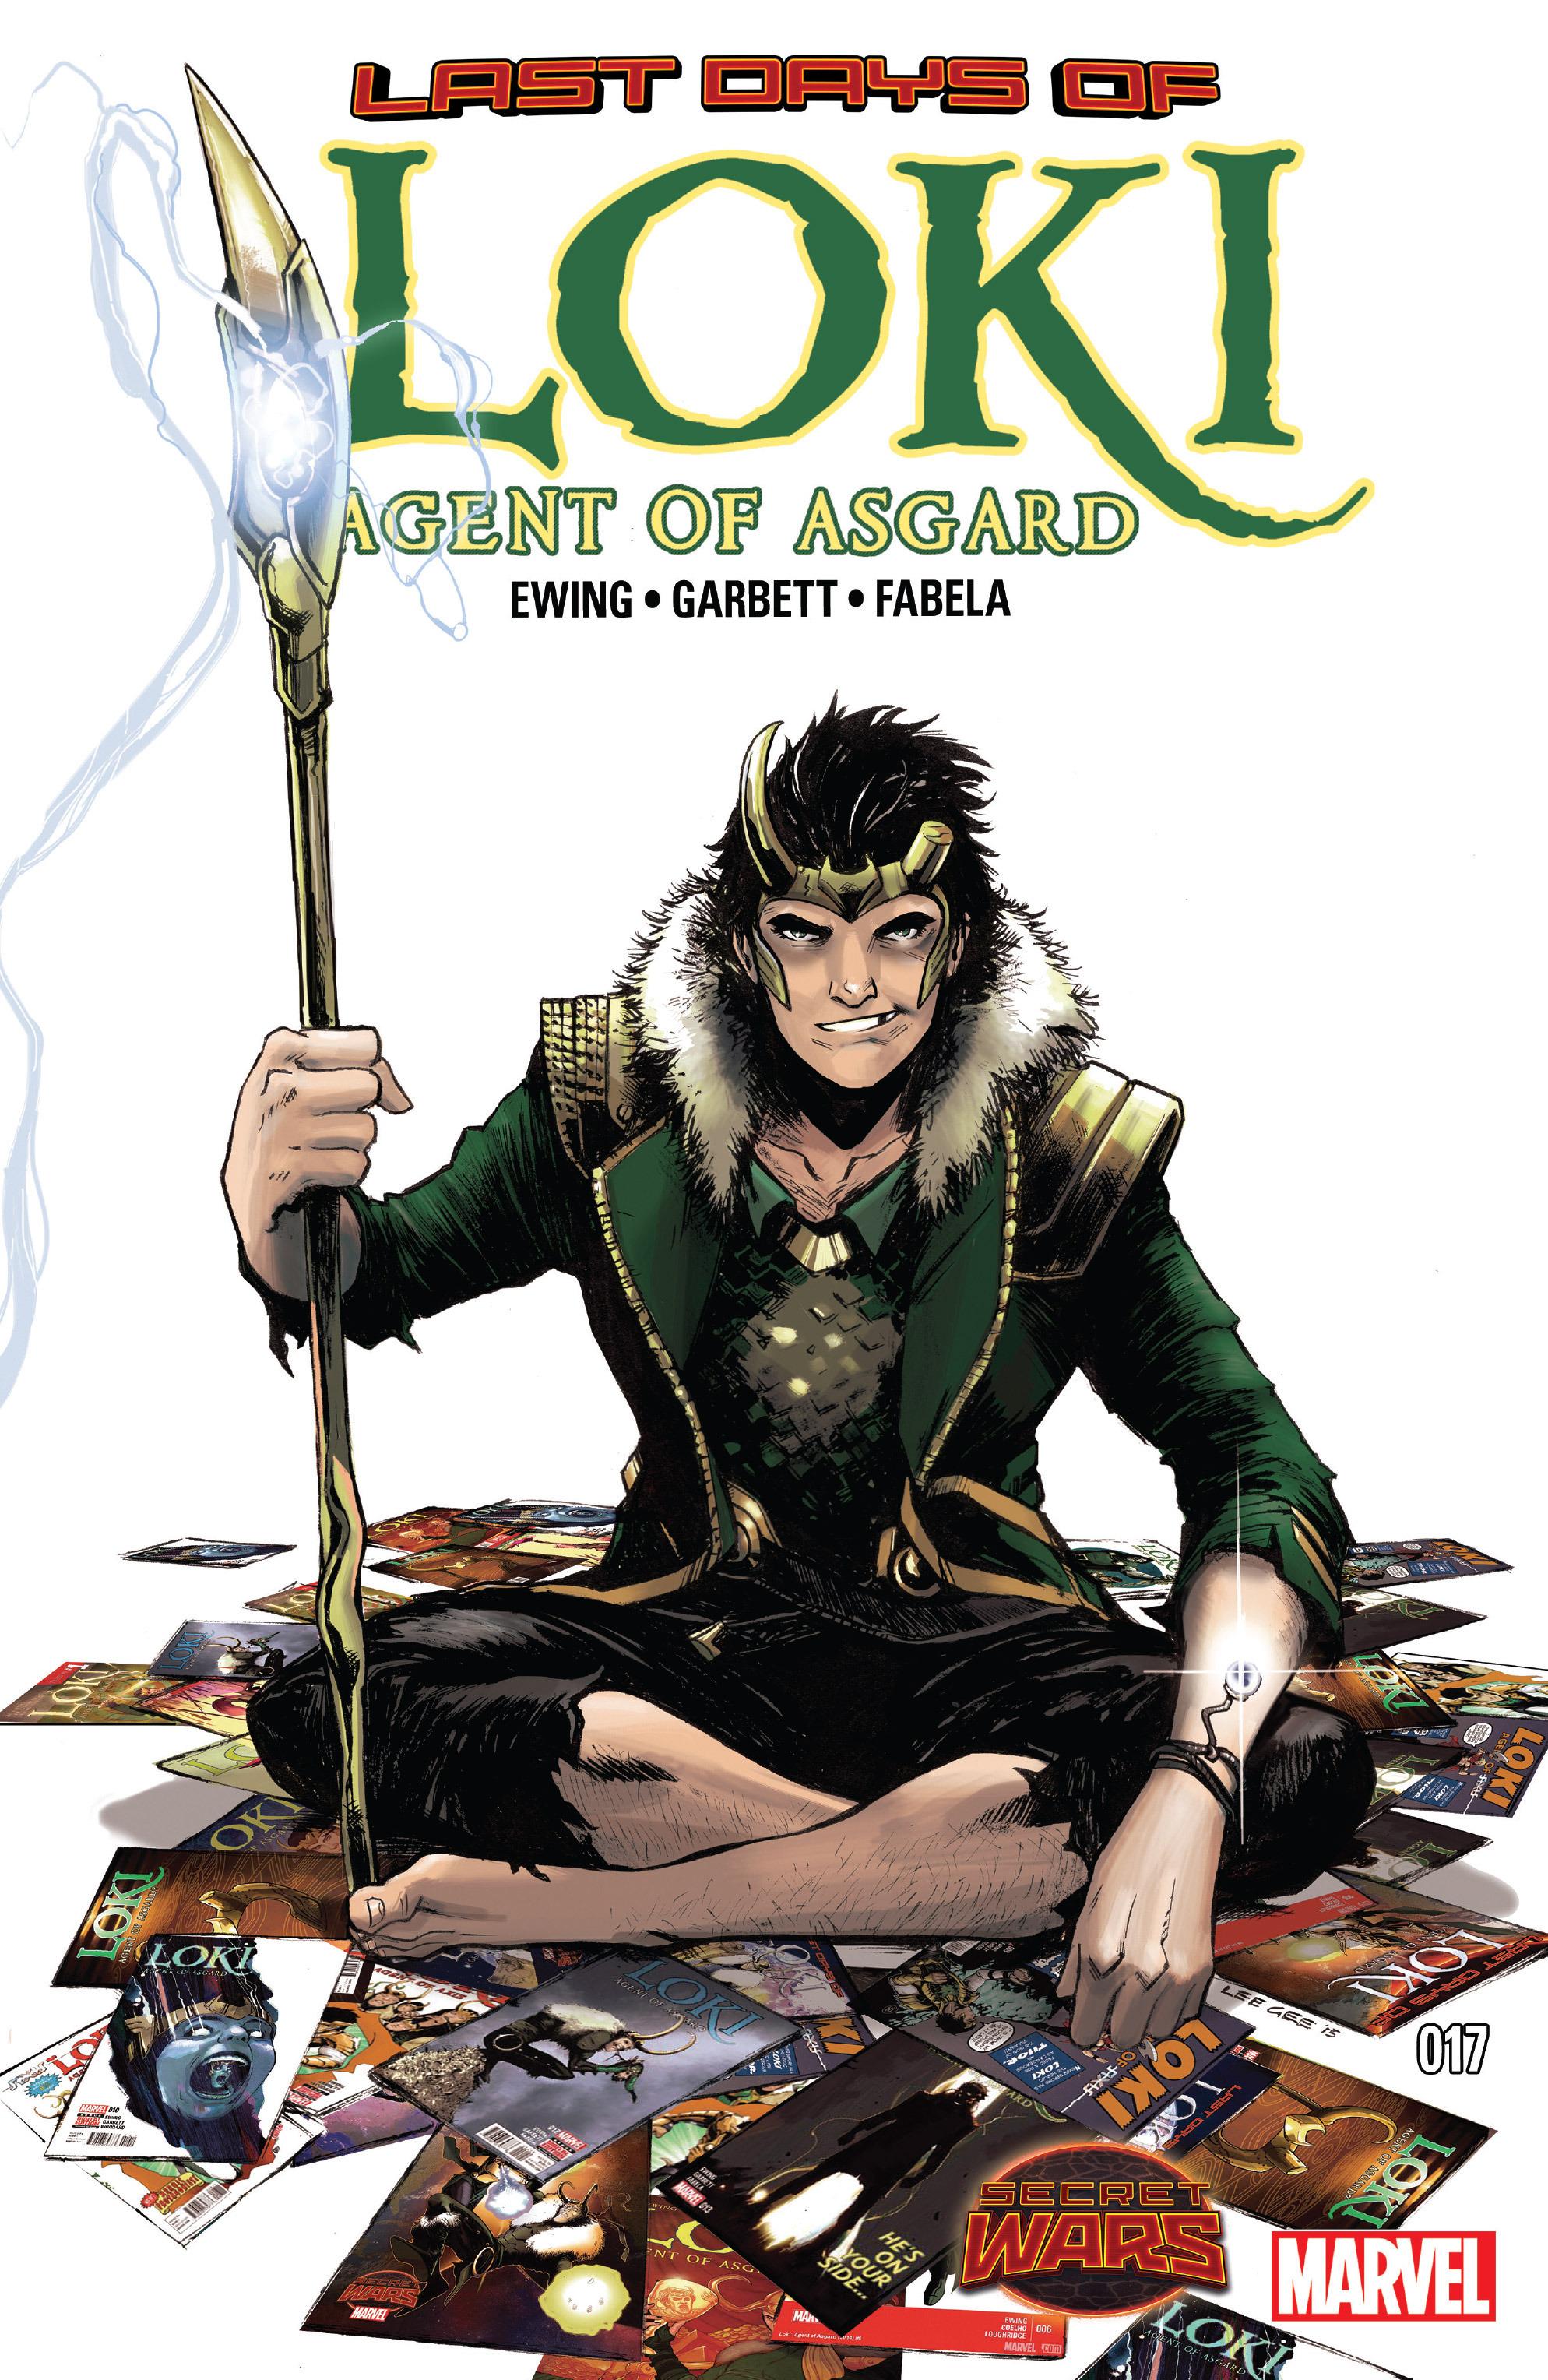 Loki: Agent of Asgard chap 17 pic 1